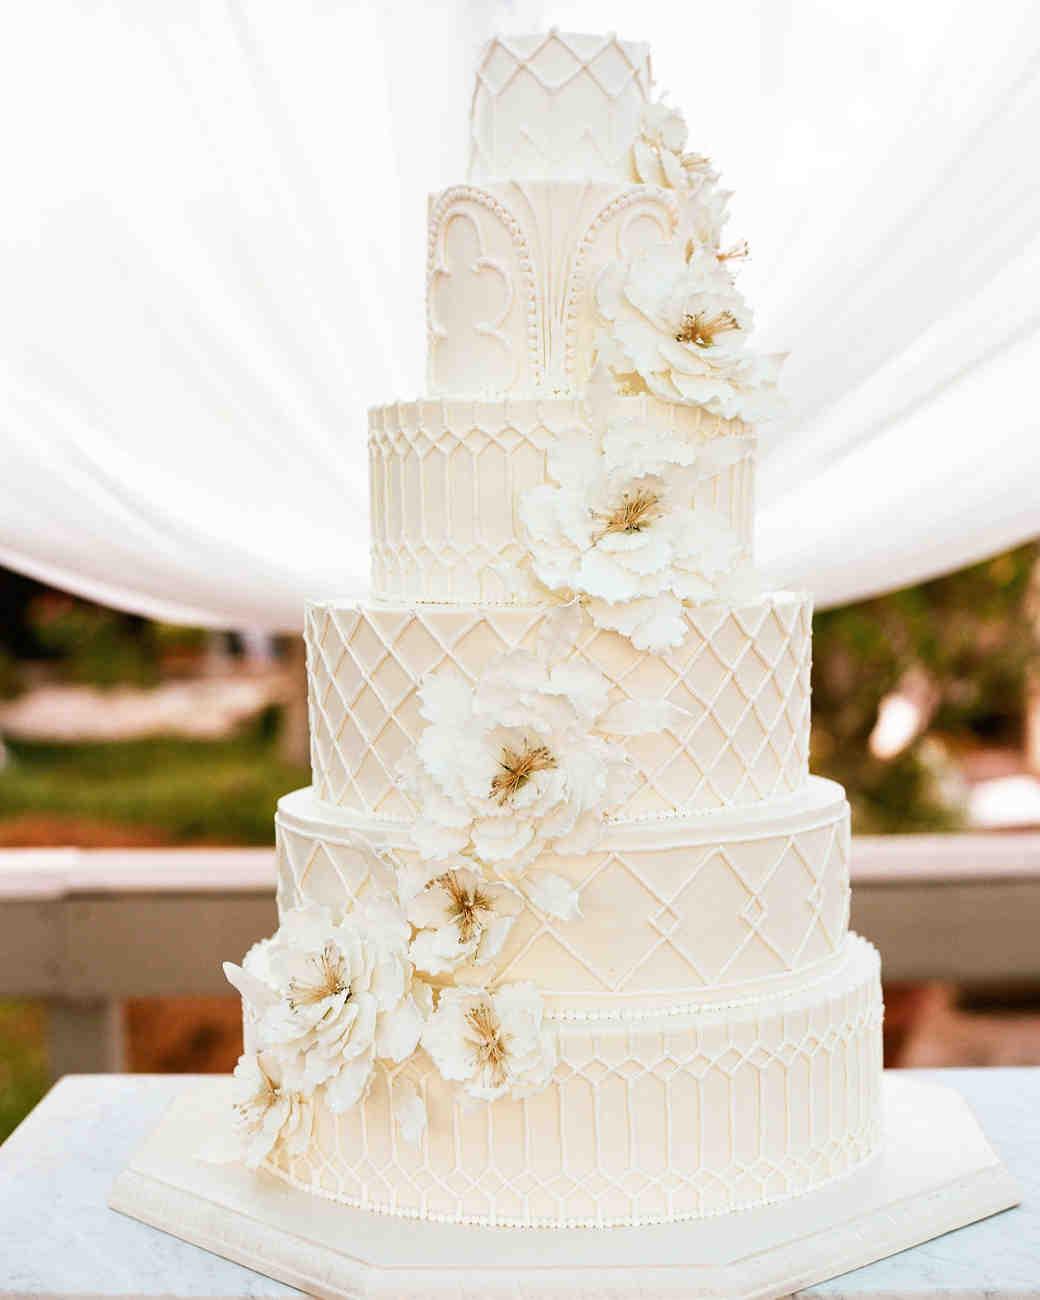 Rings For Wedding 004 - Rings For Wedding